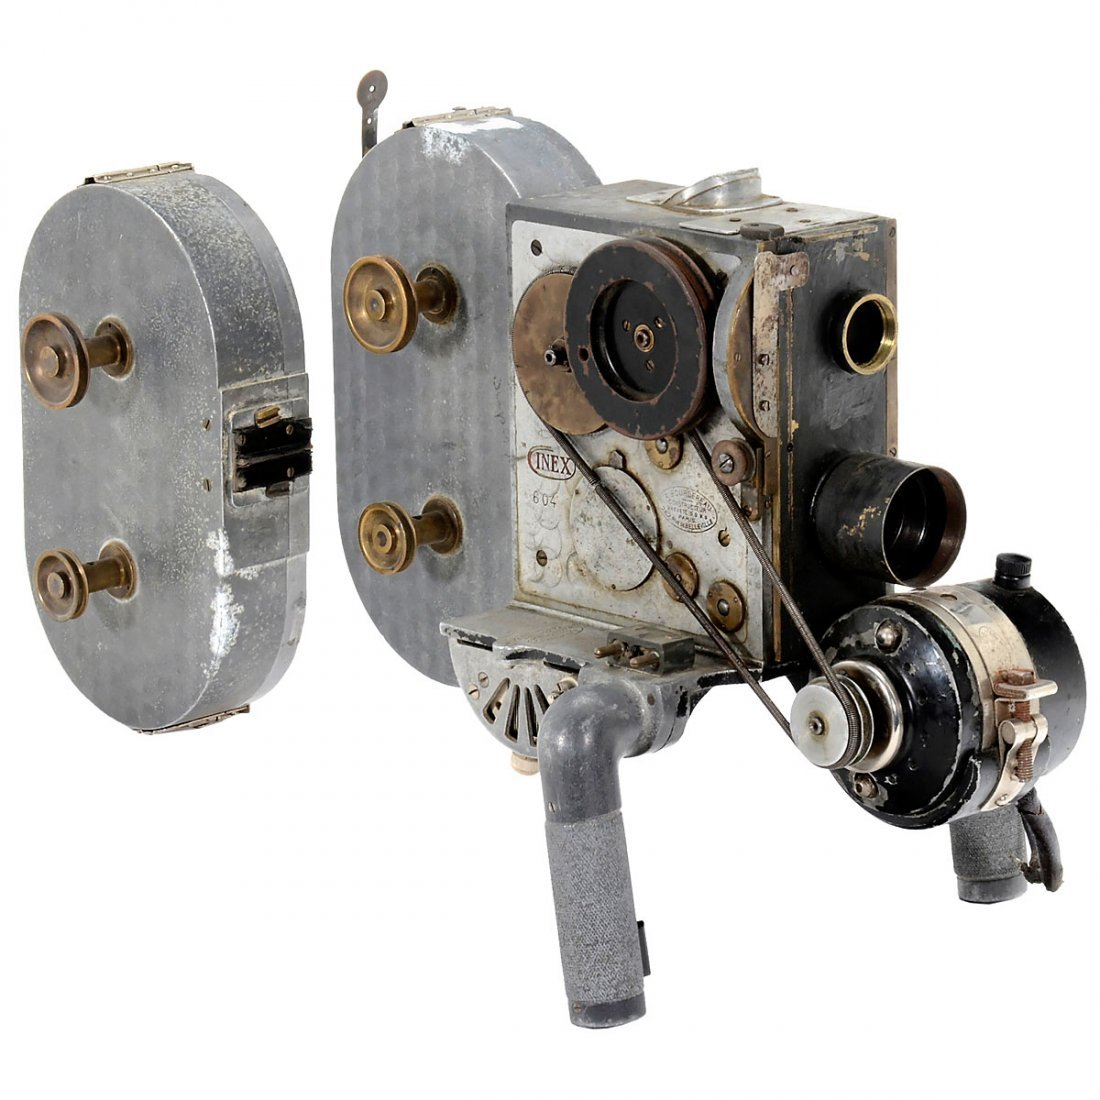 Cinex 35mm Movie Camera, c. 1925